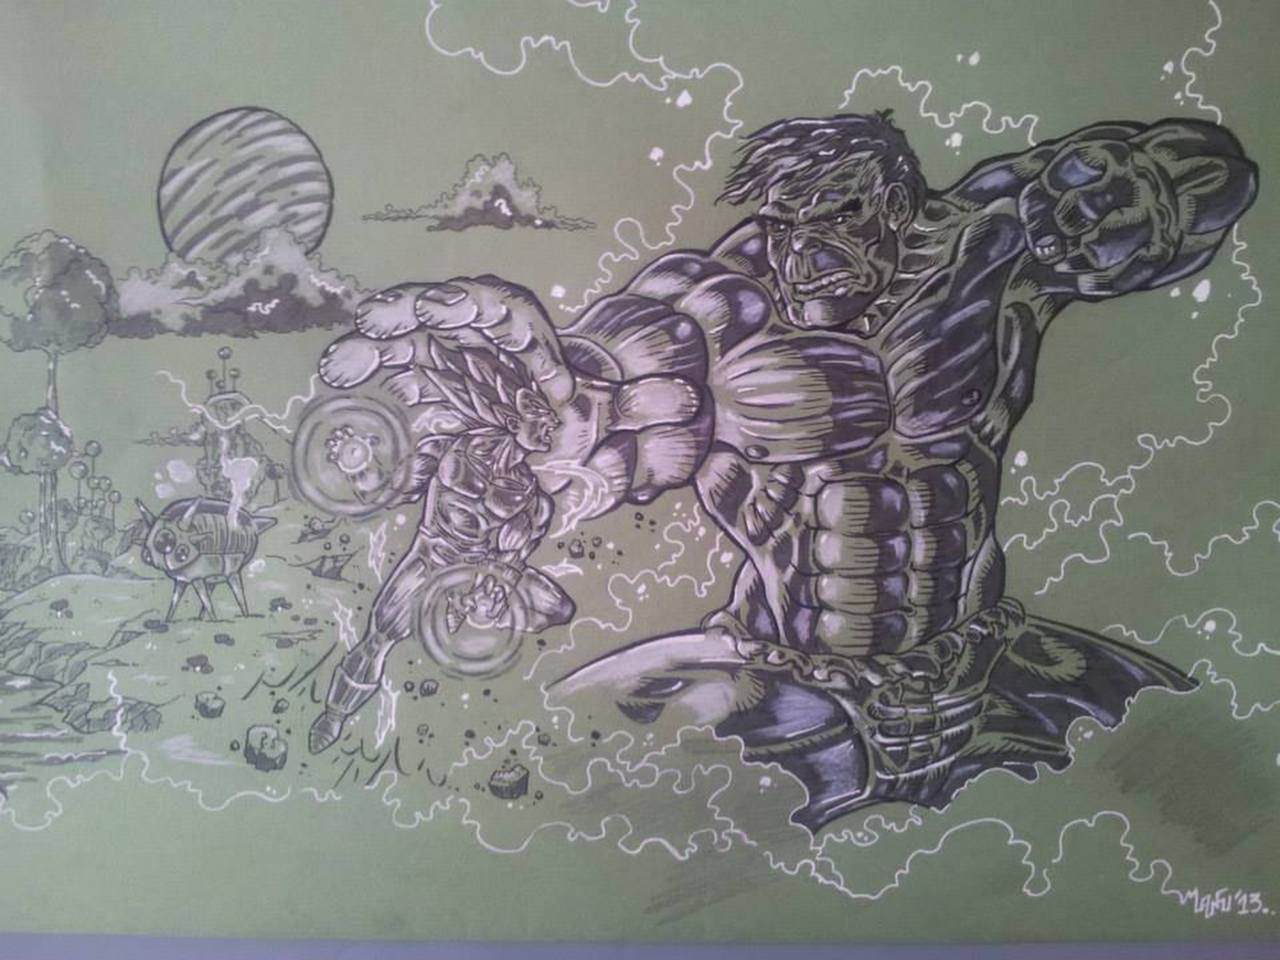 Végéta versus Hulk